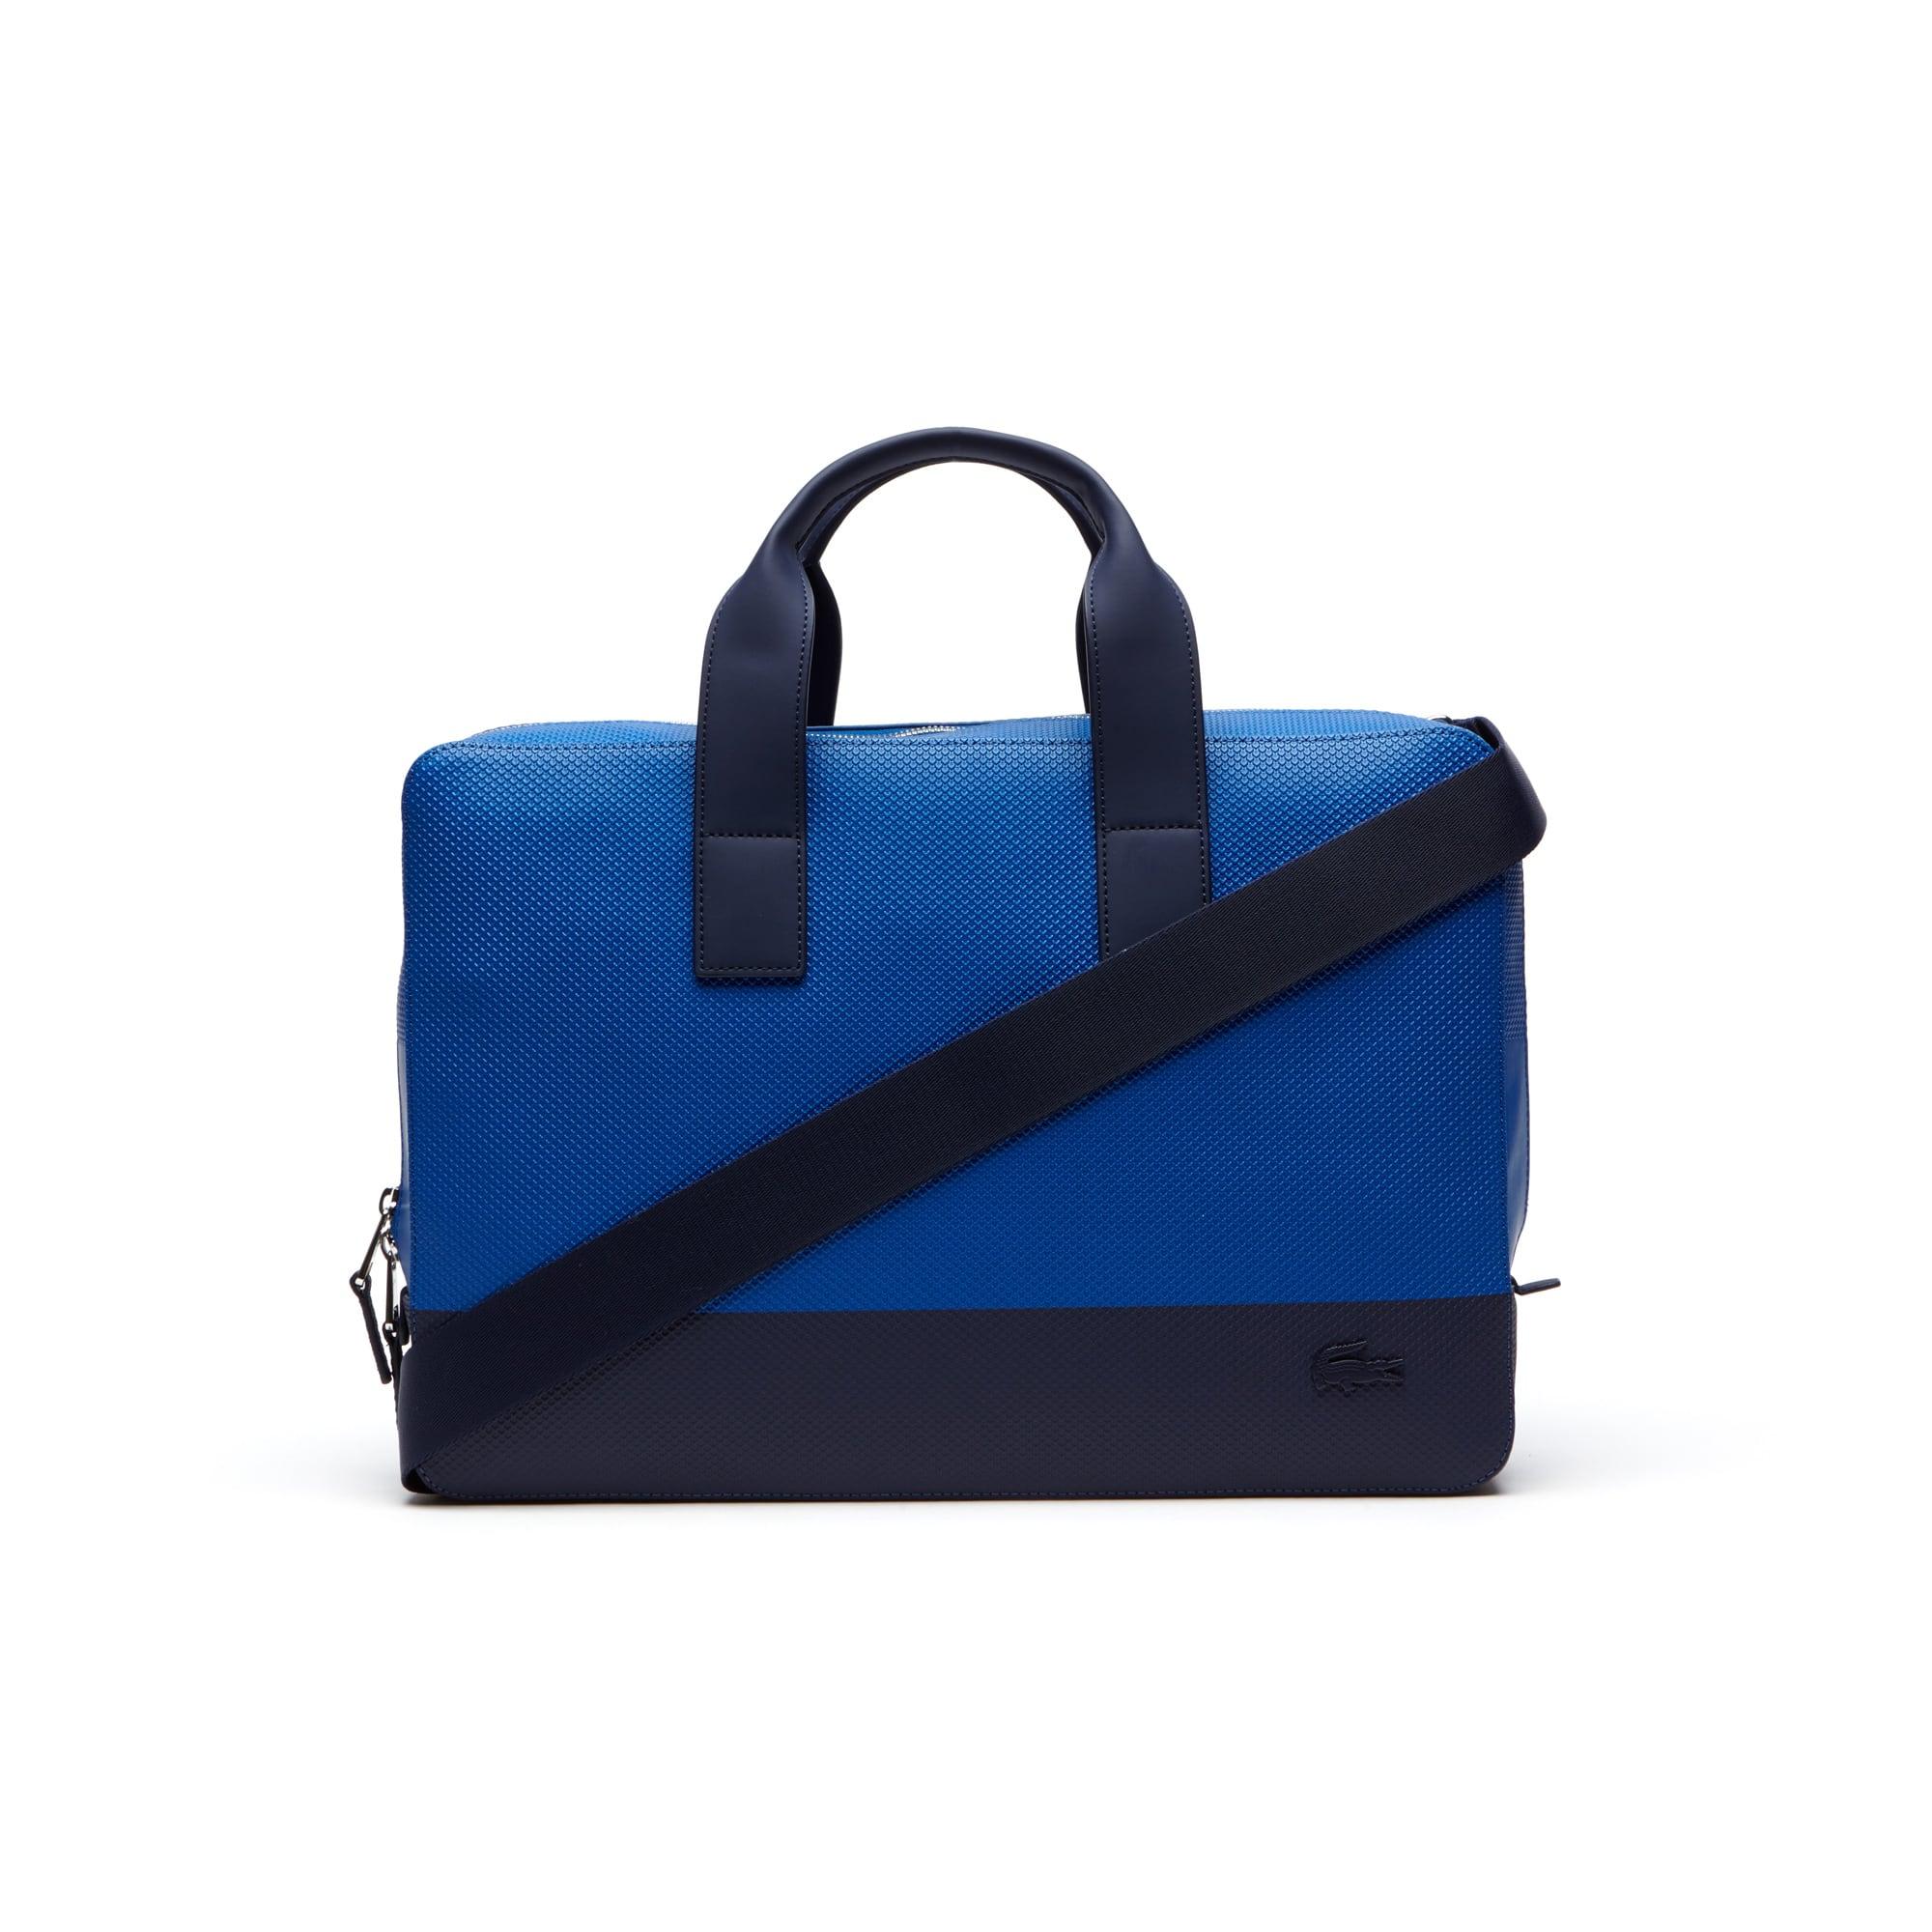 Men's Chantaco Colorblock Piqué Coated Leather Computer Bag